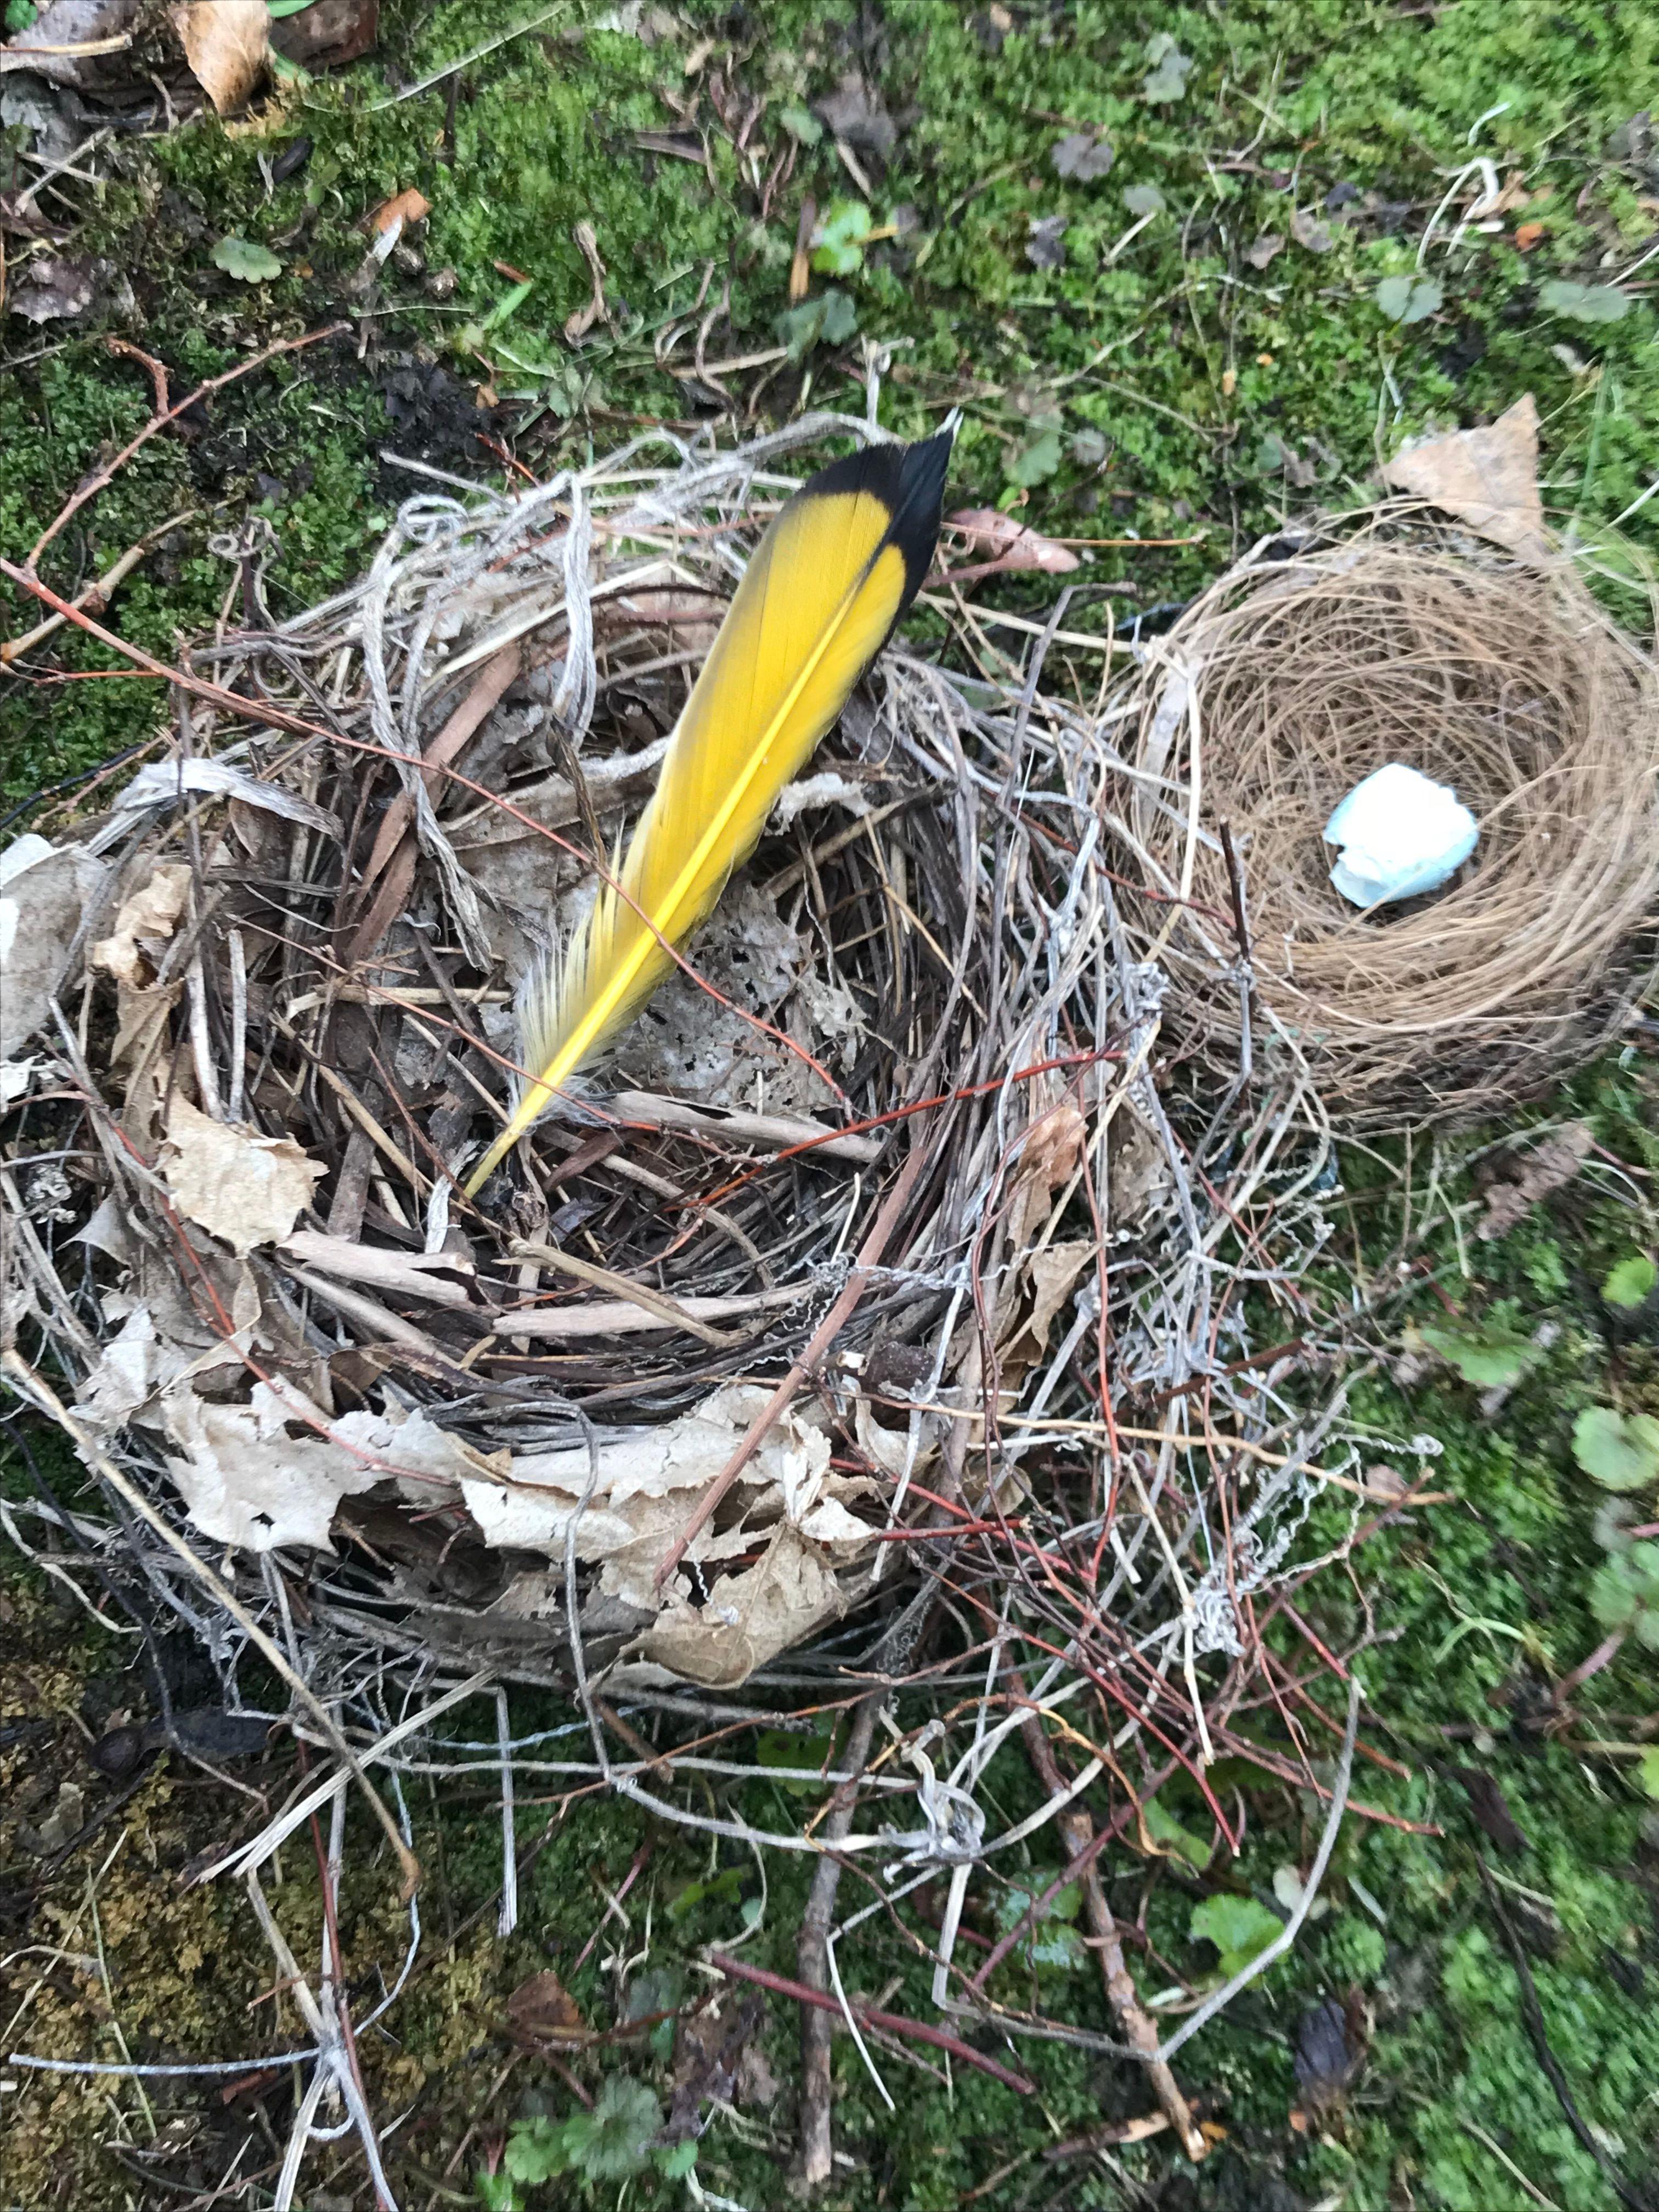 Online Kids Class - Nests and Backyard Treasures